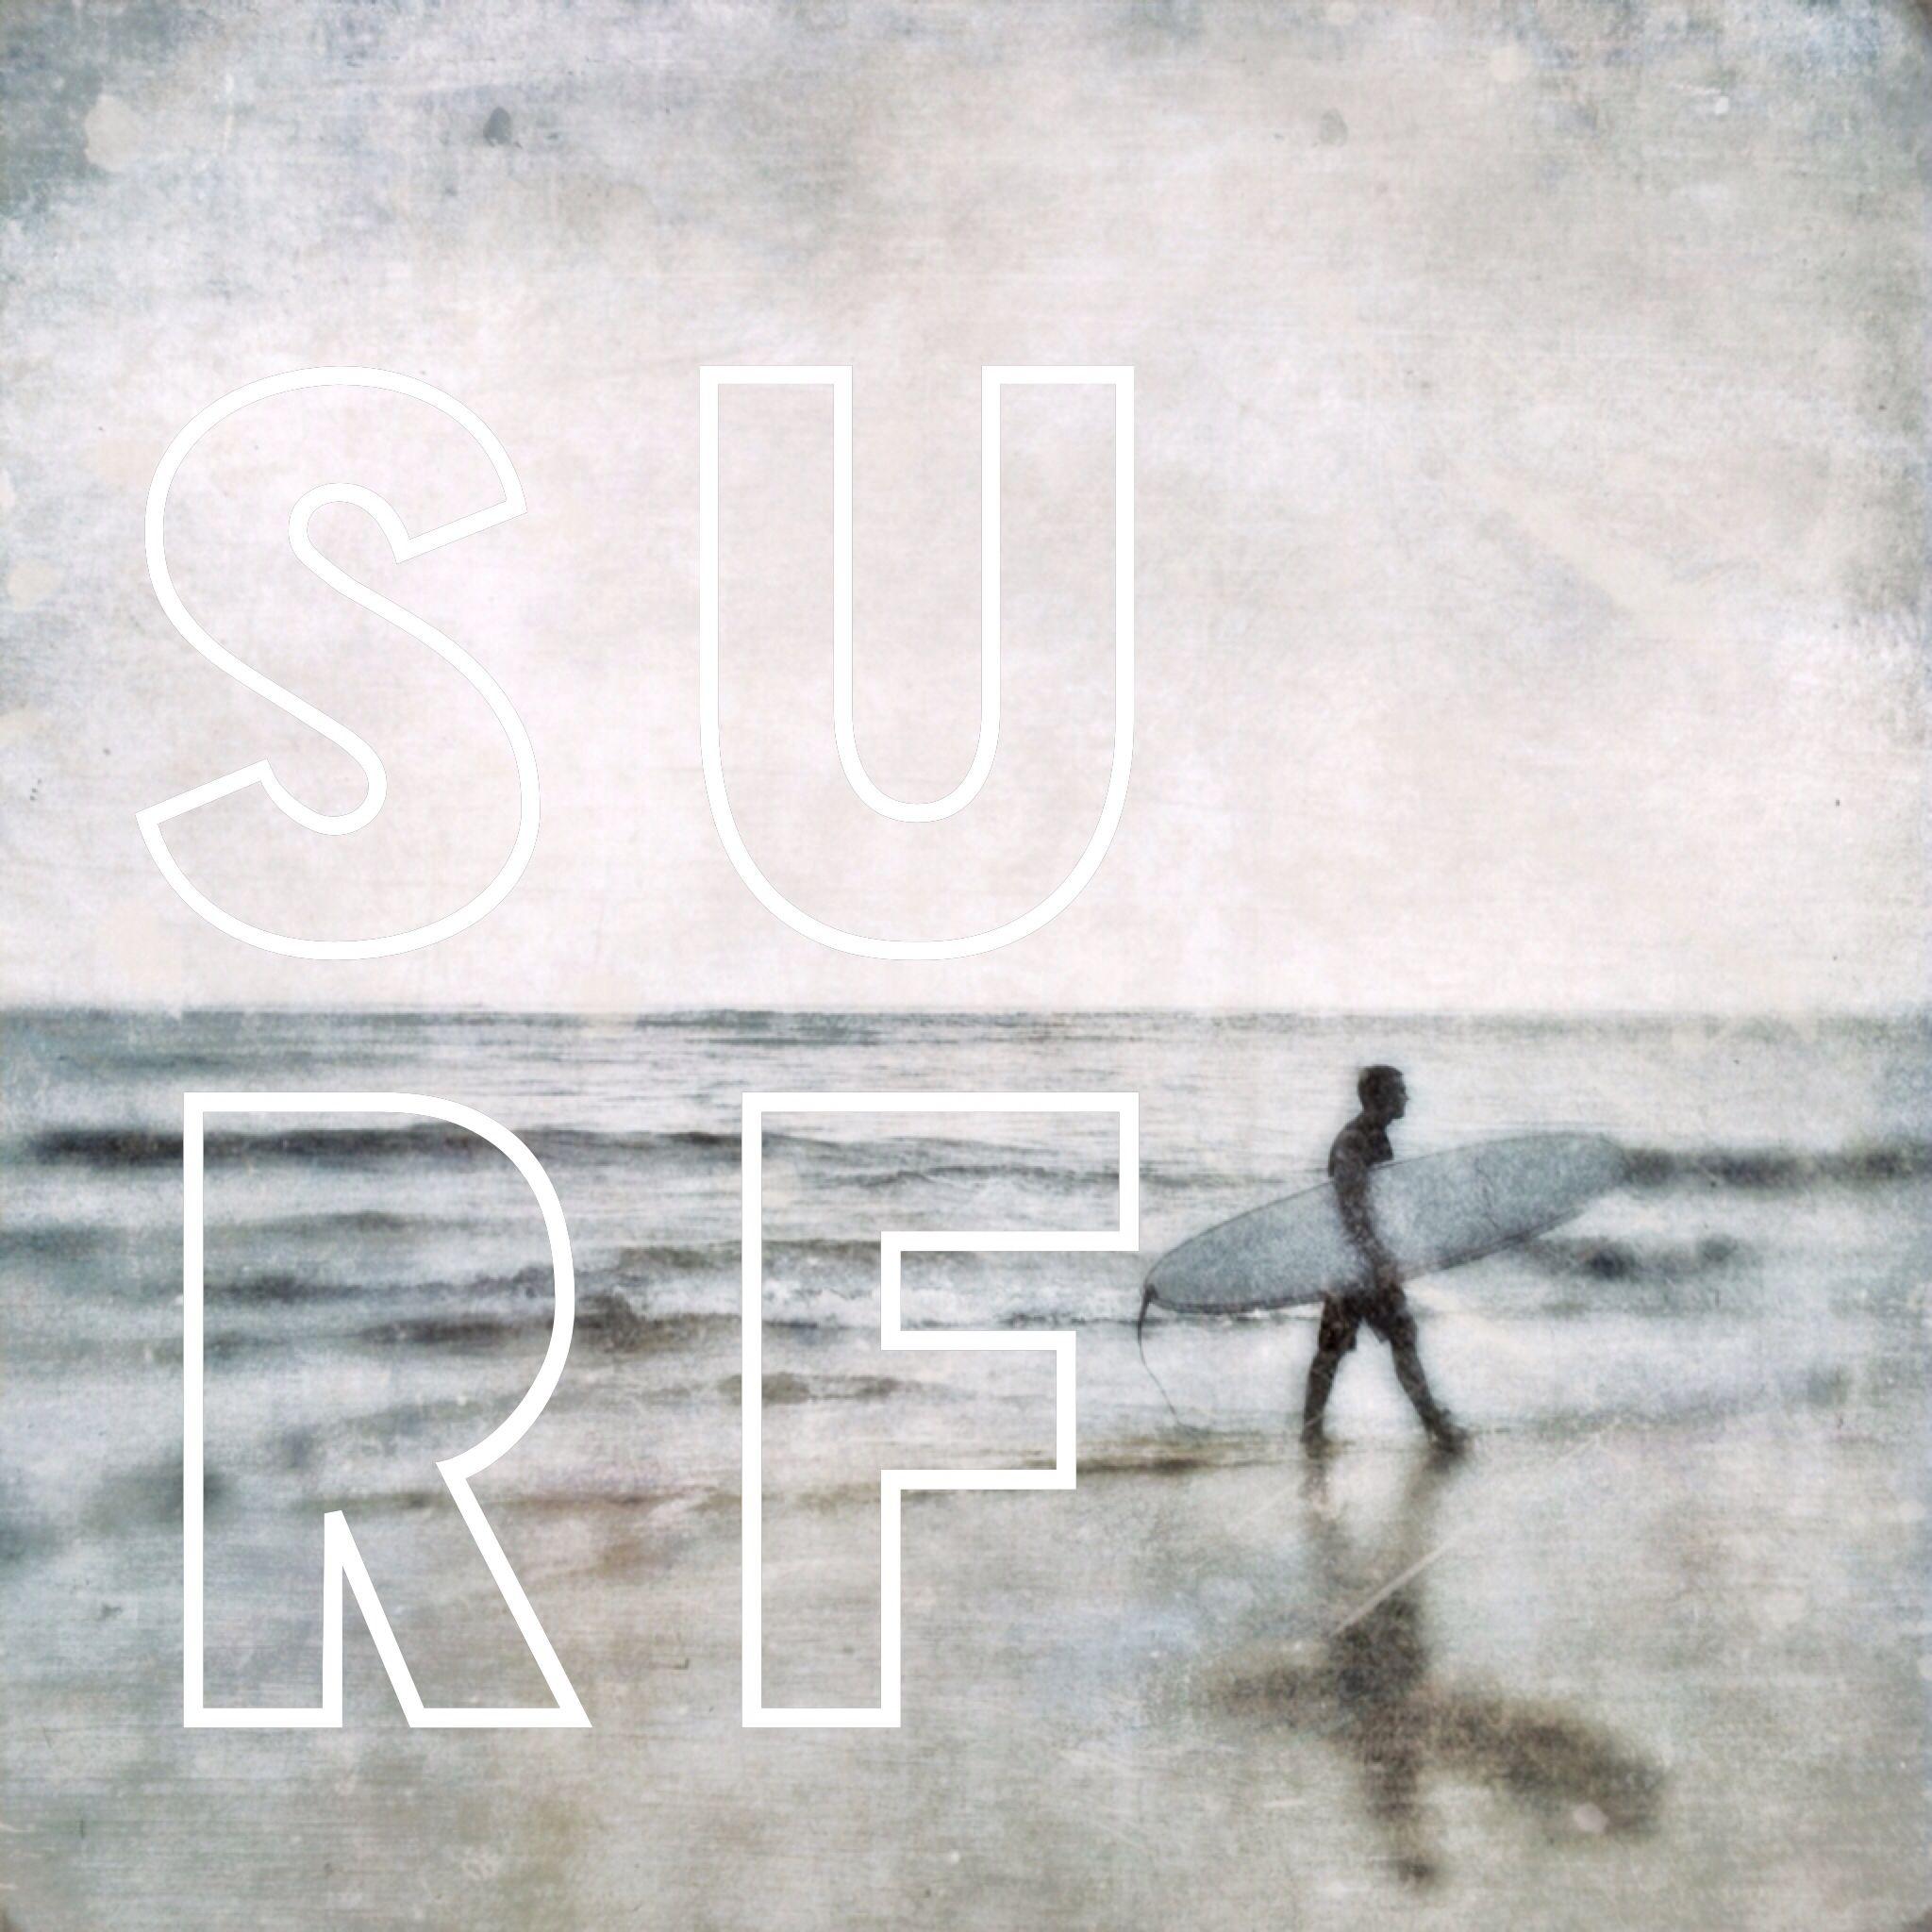 Hanalei / Surf